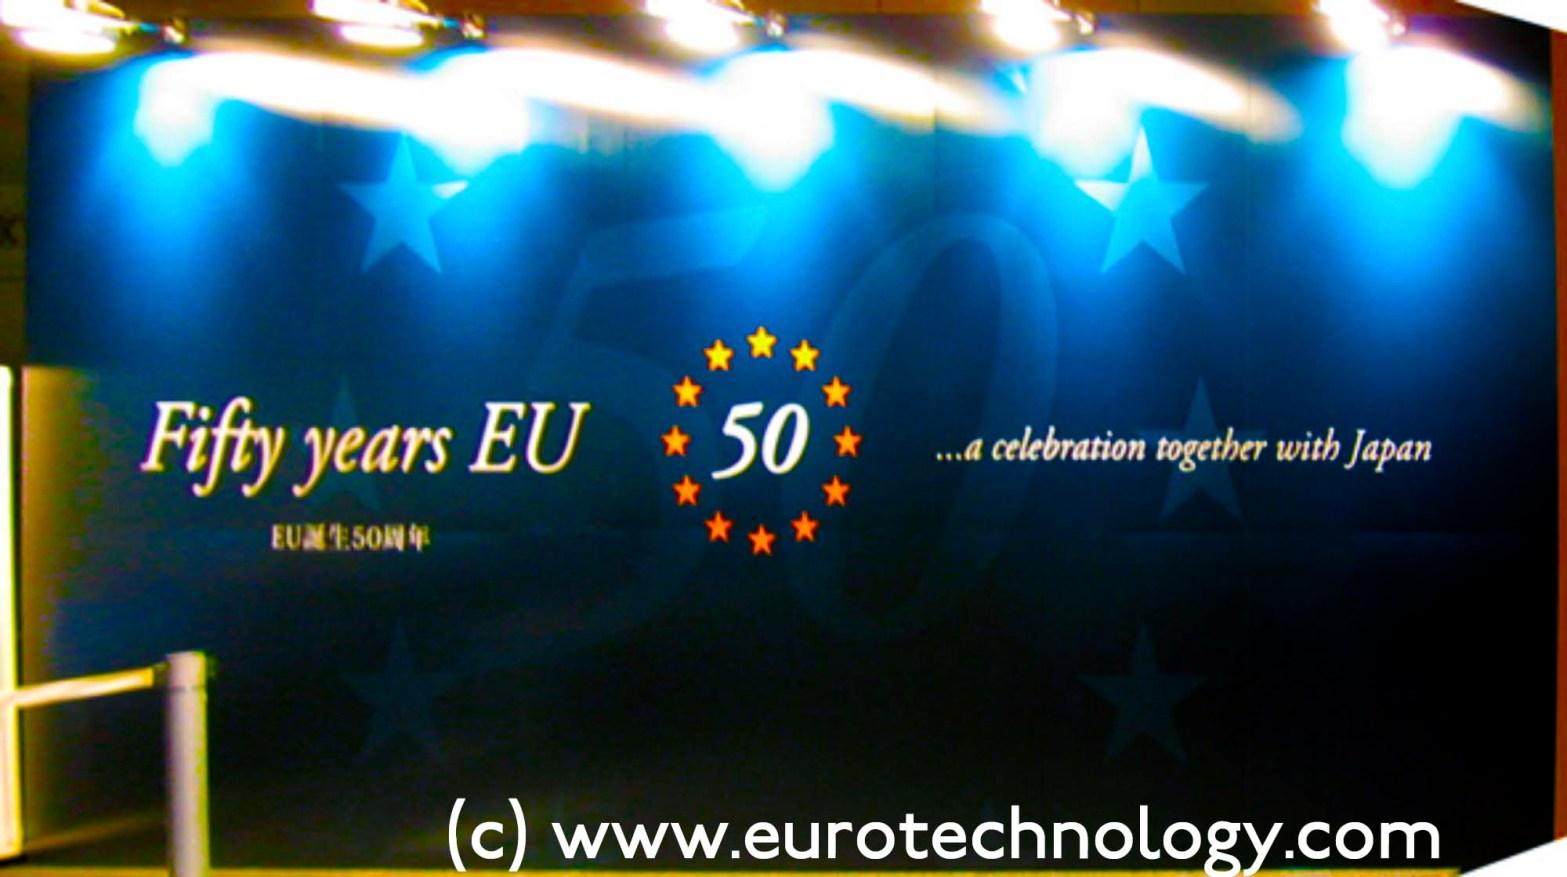 50 years EU celebration in Tokyo